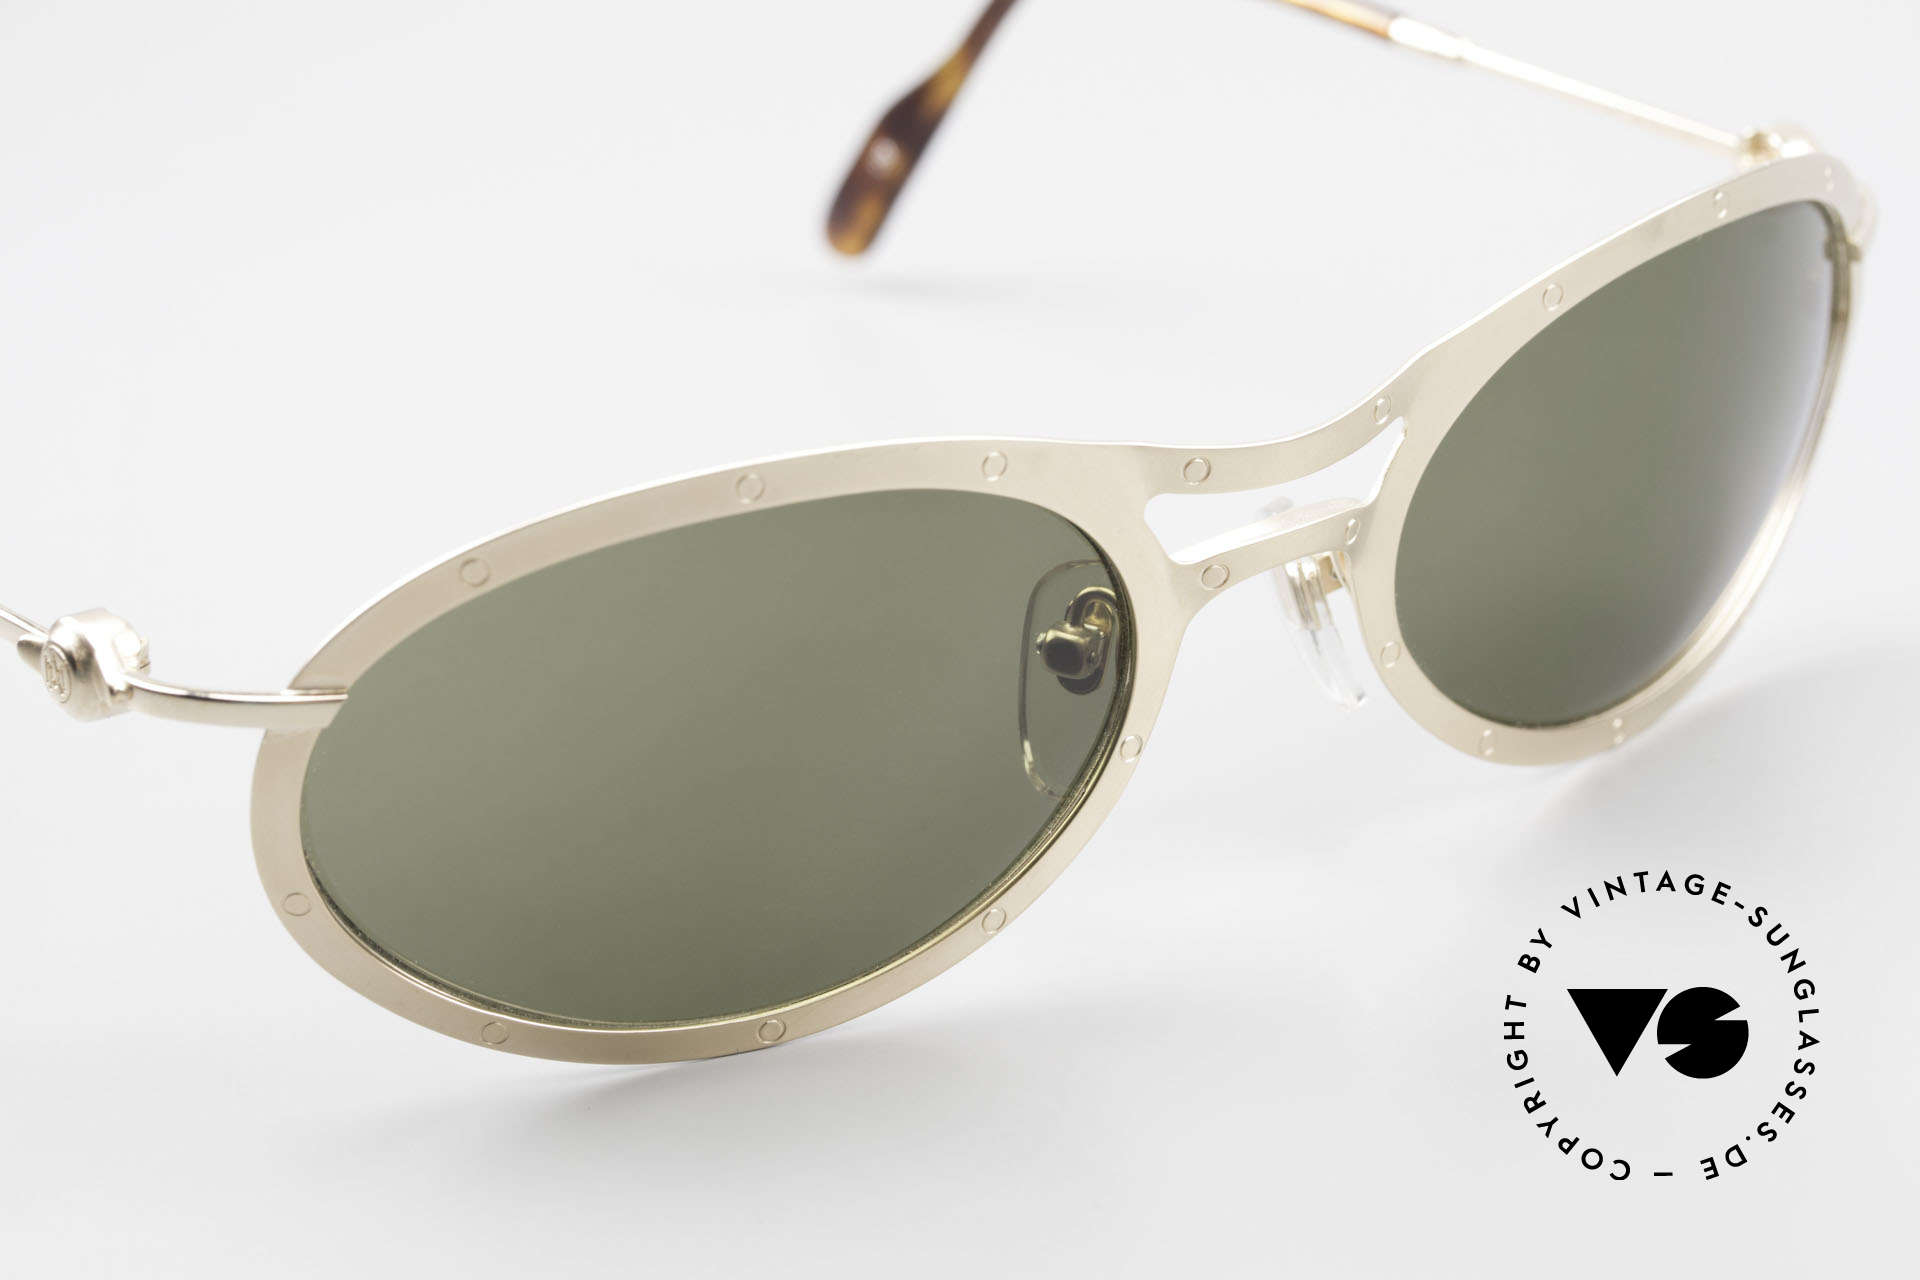 Aston Martin AM33 Sporty Luxury Sunglasses 90's, NO RETRO design glasses, but a unique 1990's original!, Made for Men